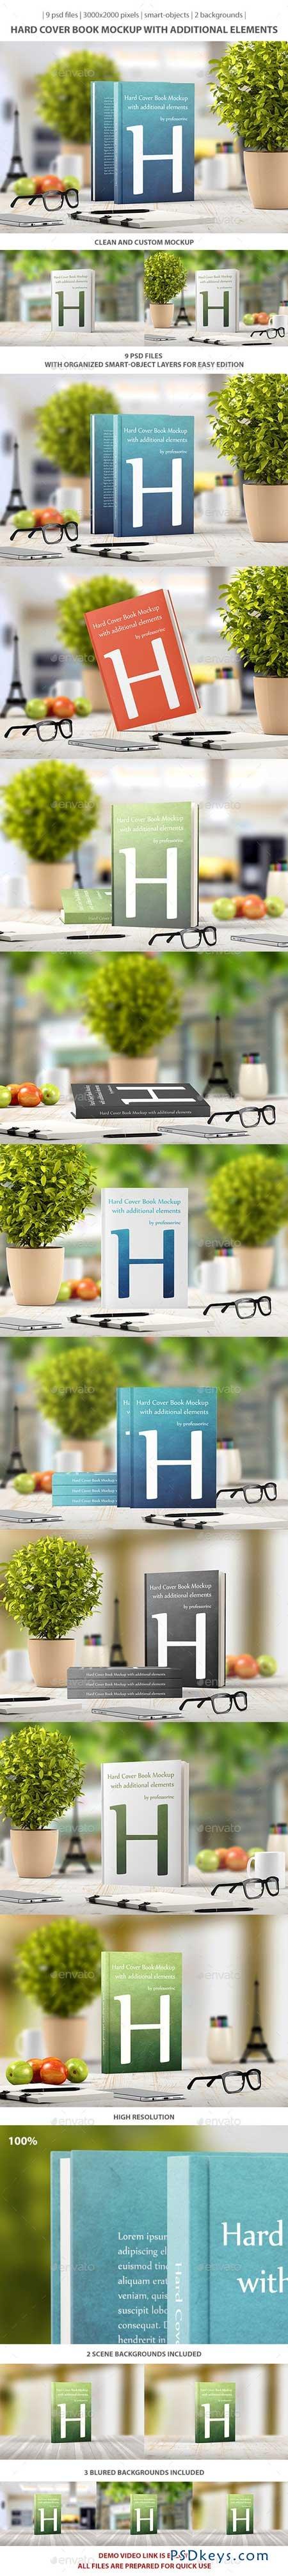 Hard Cover Book Mockup 9435271